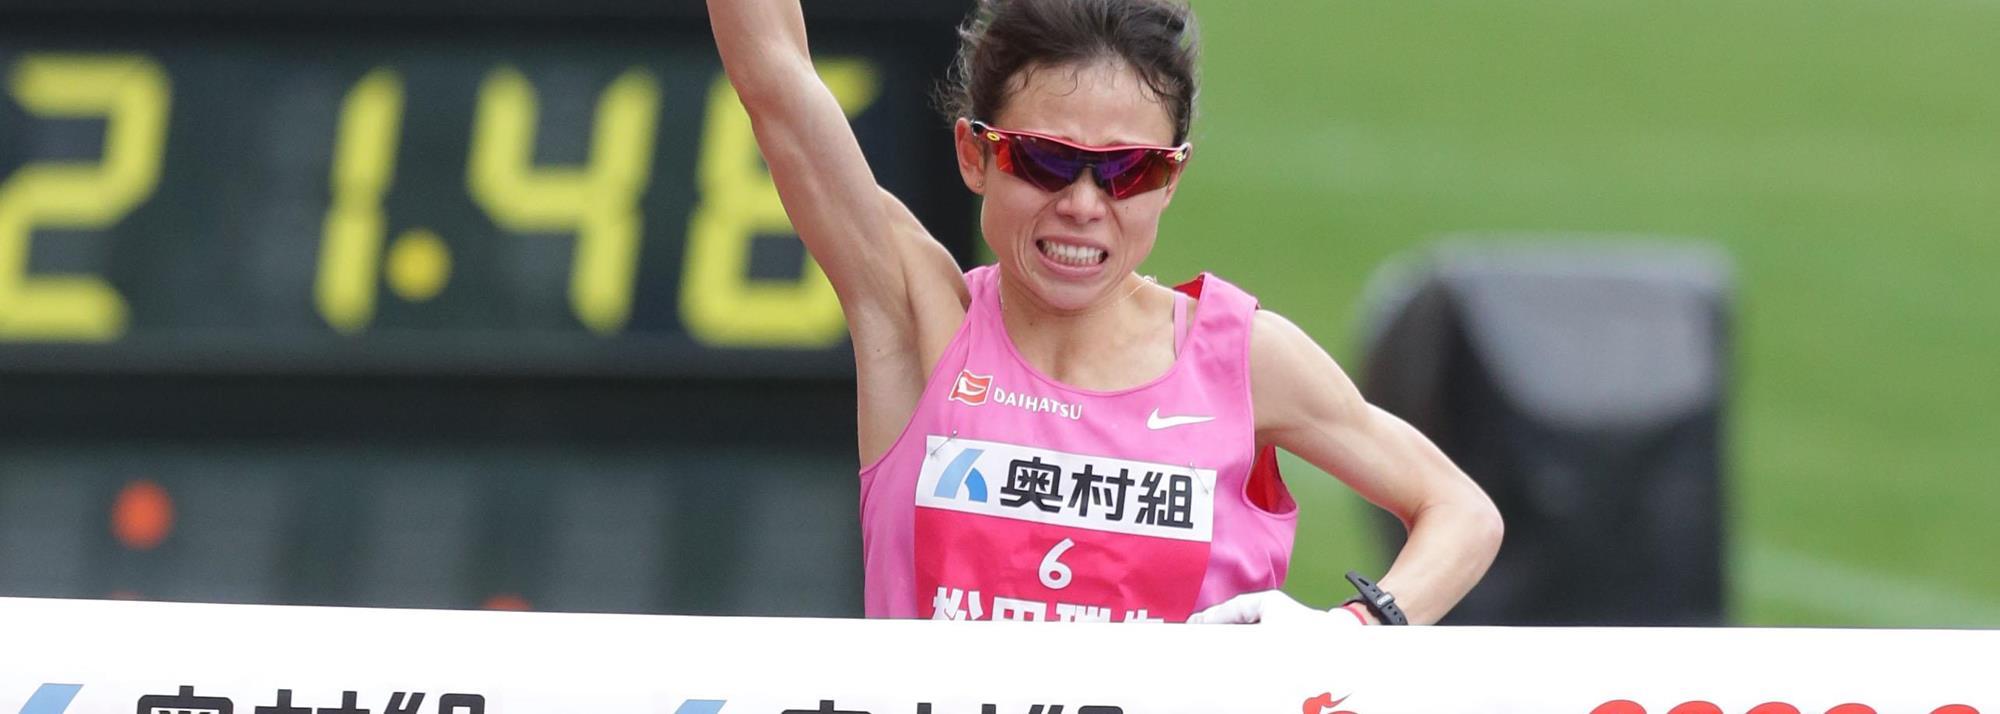 Matsuda wins Osaka Women's Marathon